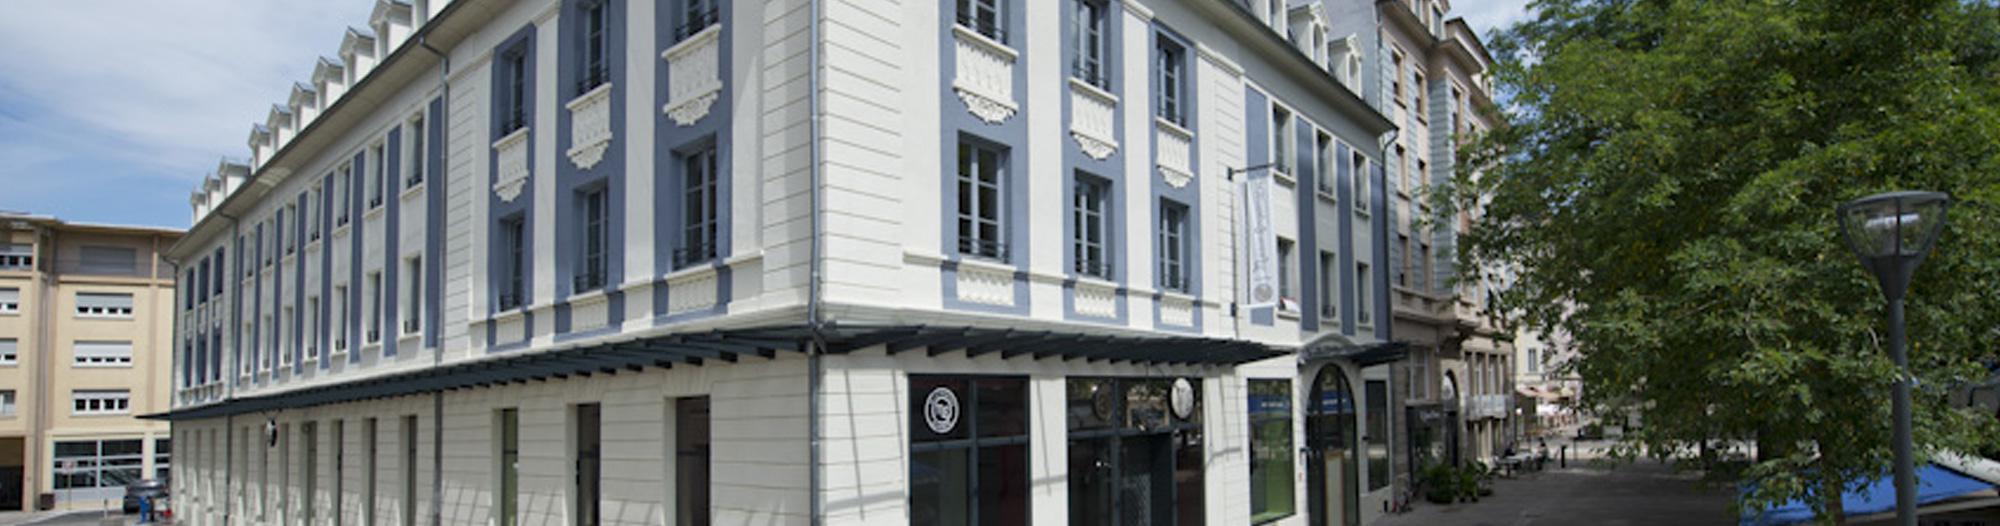 Maison Engelmann